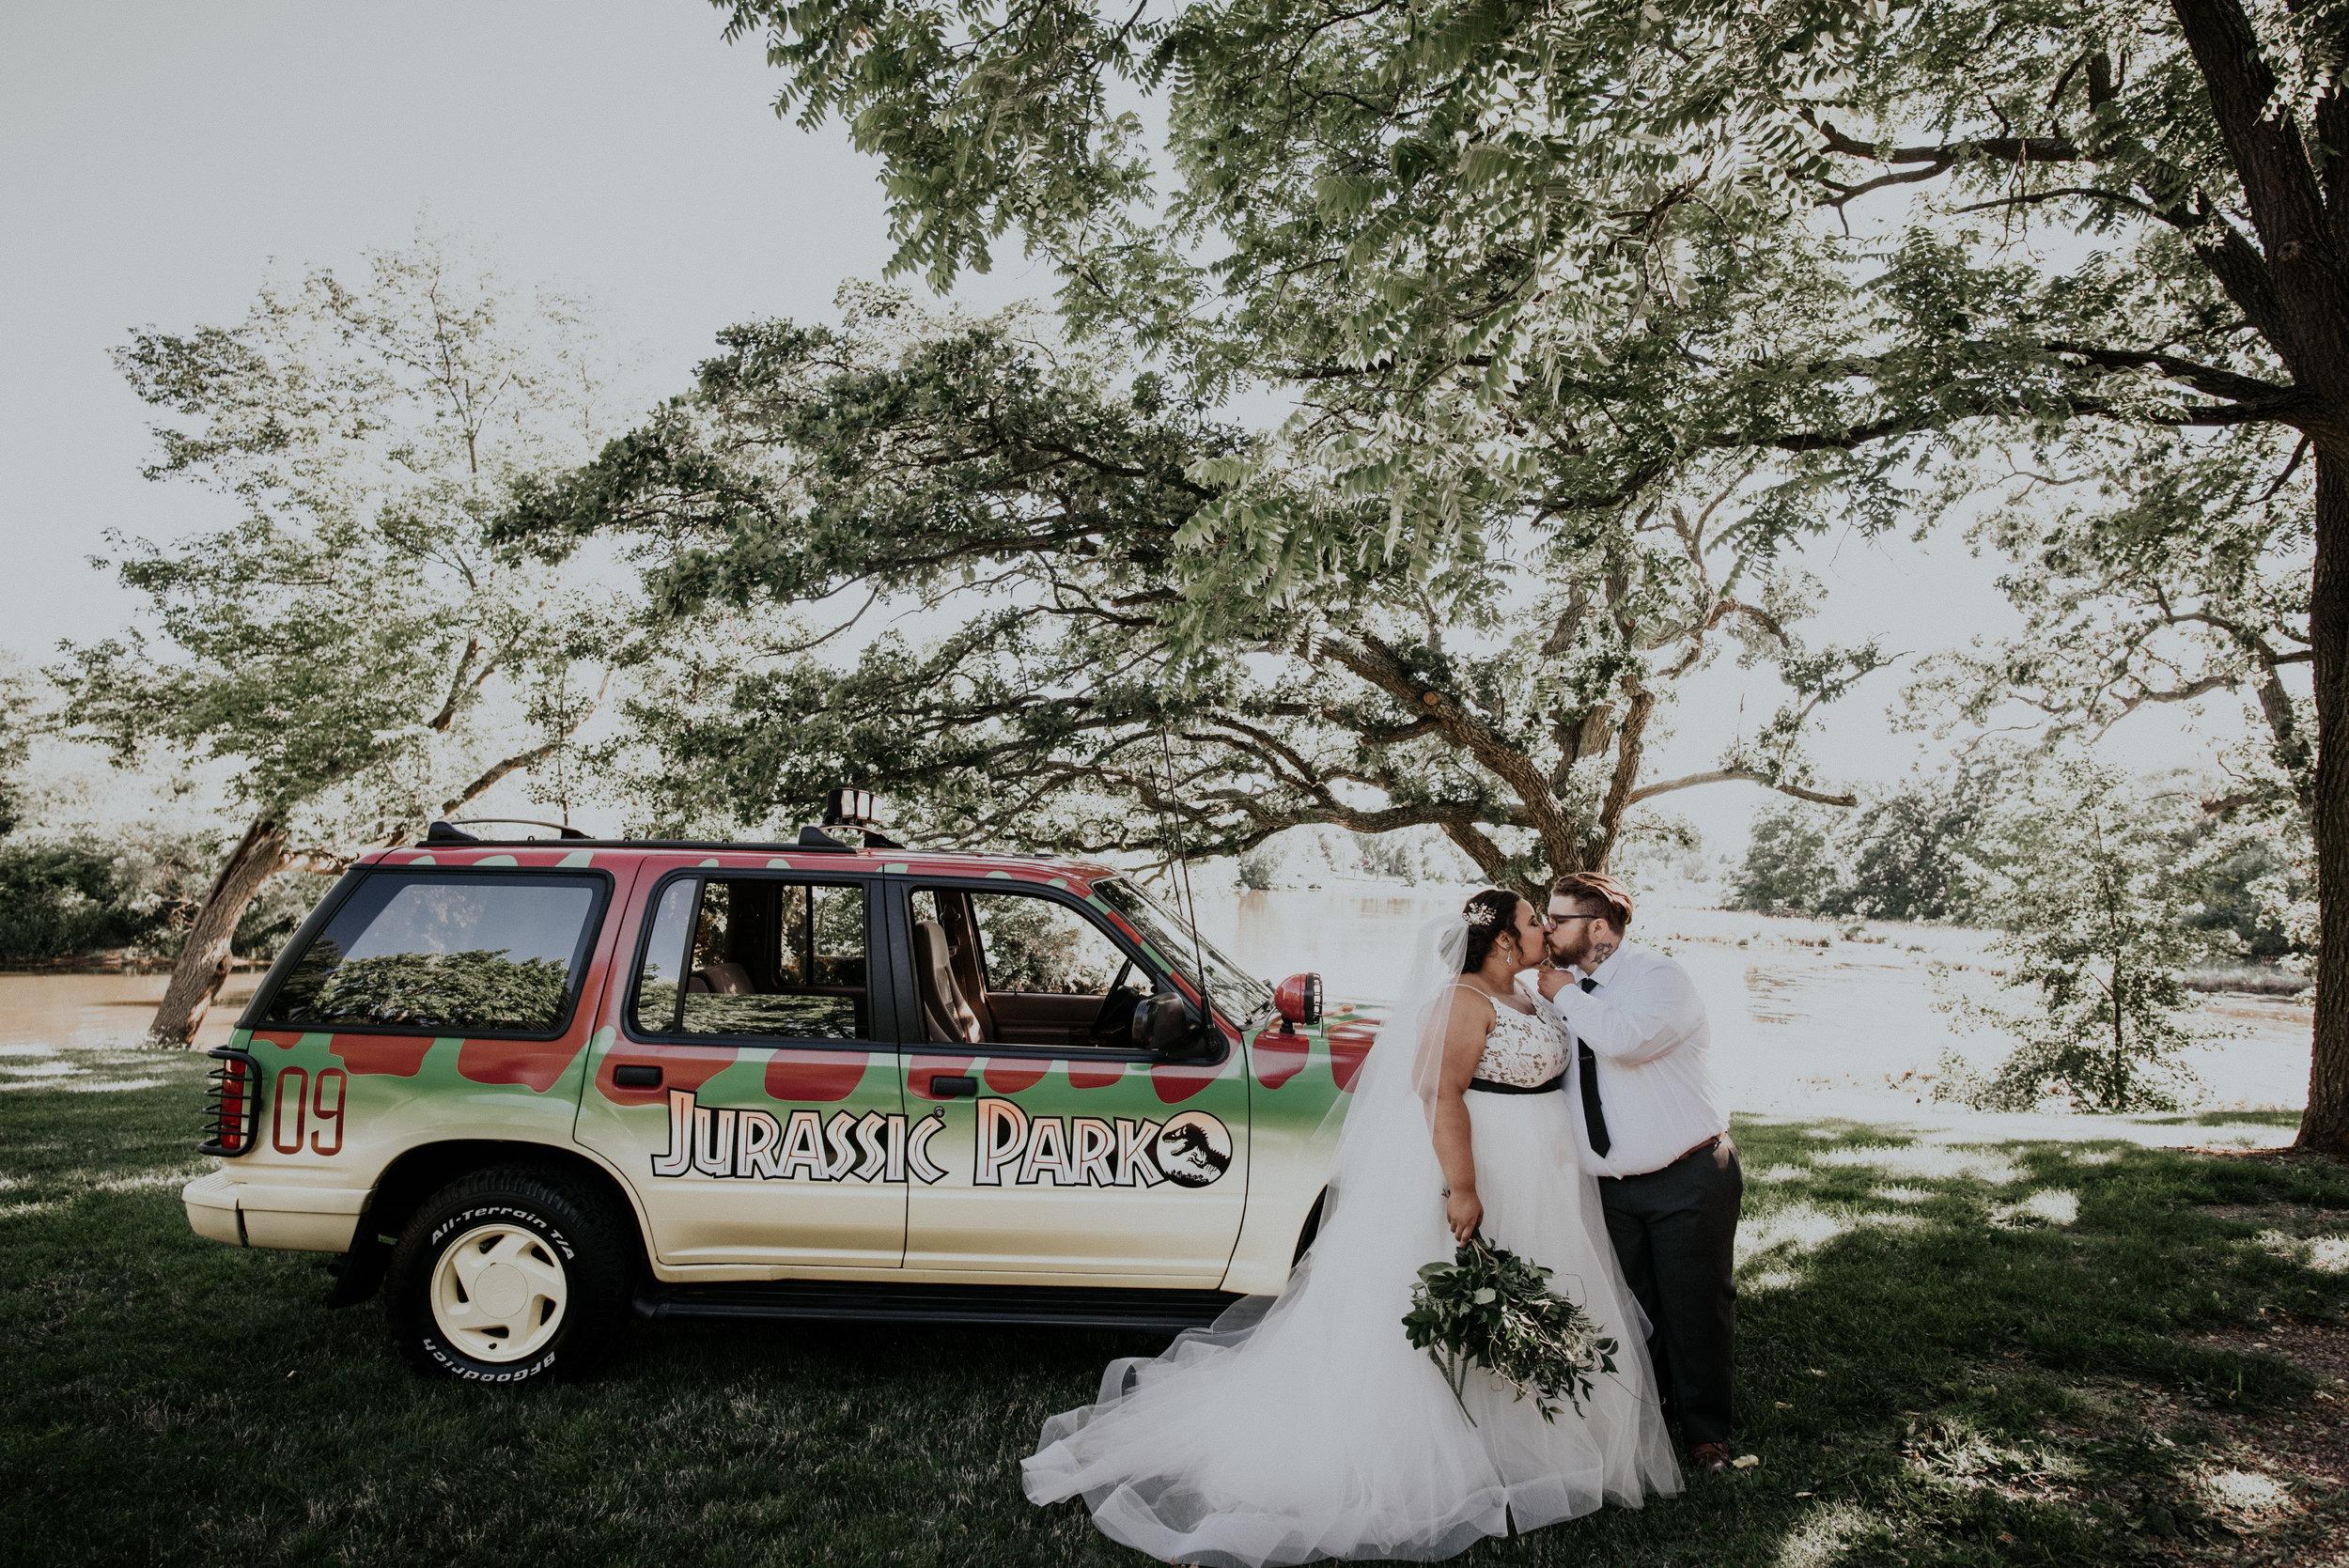 BridesbyYoung-RealWedding-PlusSizeBridal-BillyCourtney-JurassicParkTheme-39.jpg